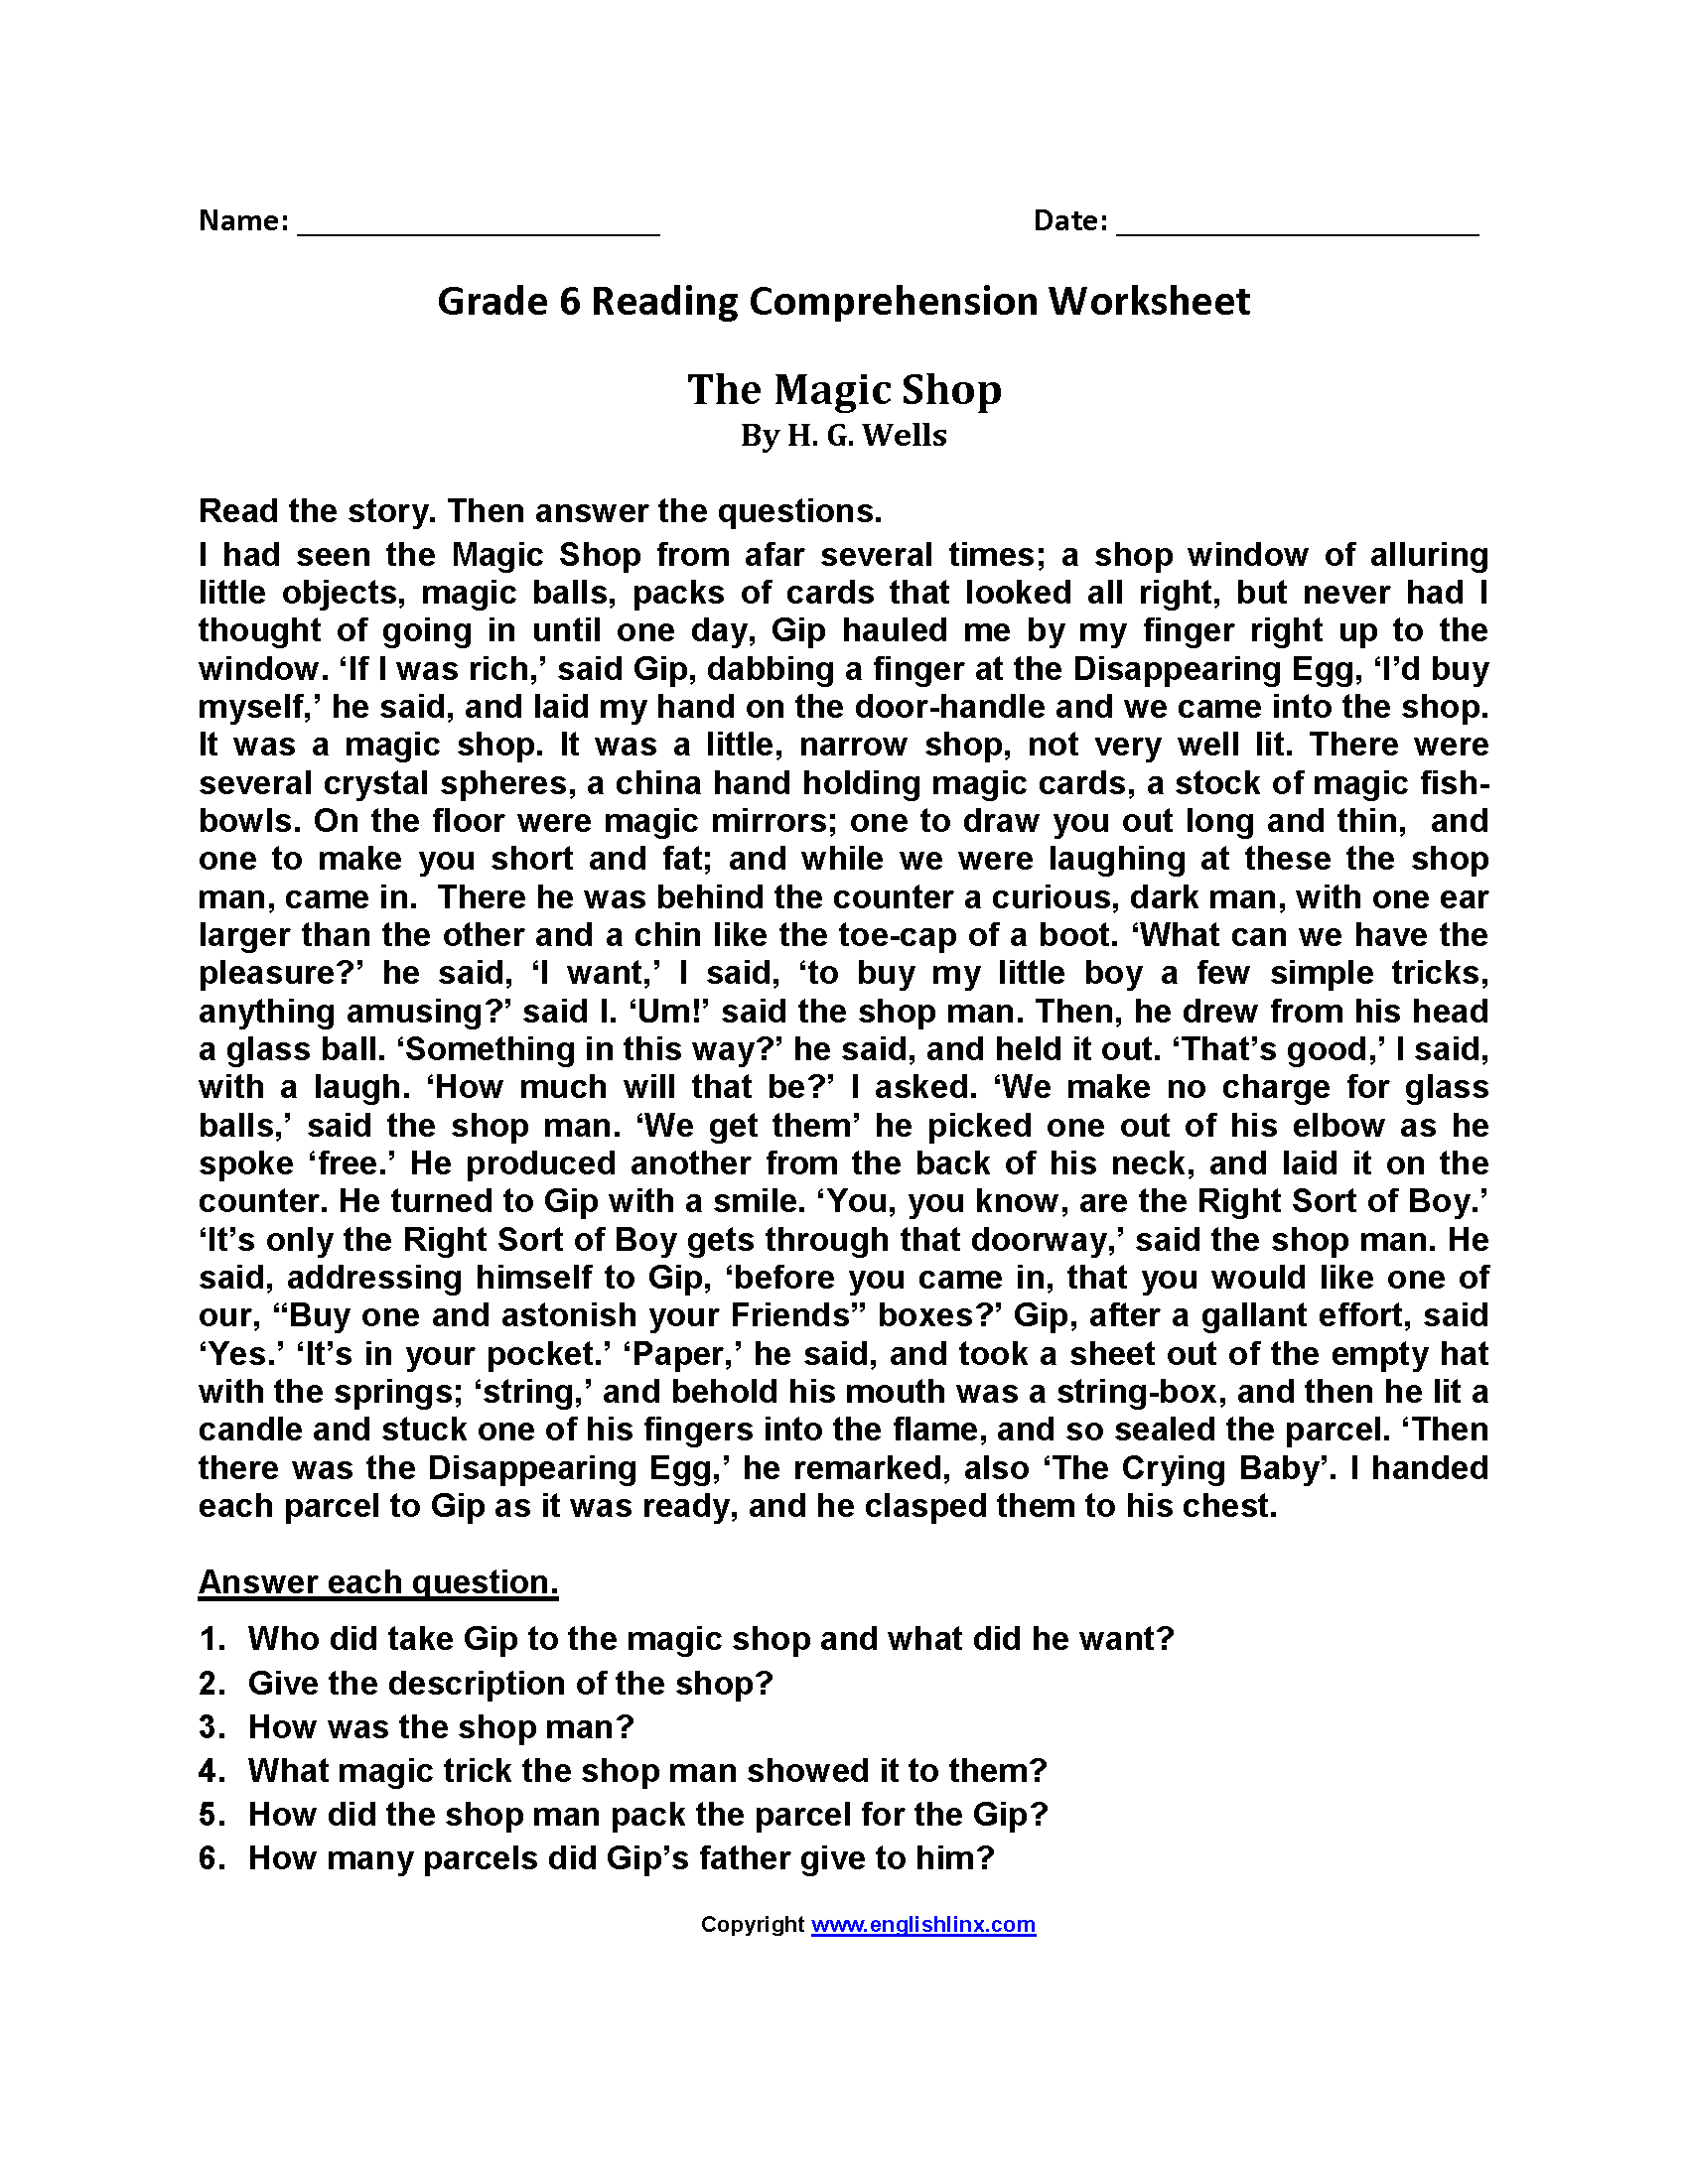 Reading Worksheets   Sixth Grade Reading Worksheets   Comprehension  worksheets [ 2200 x 1700 Pixel ]